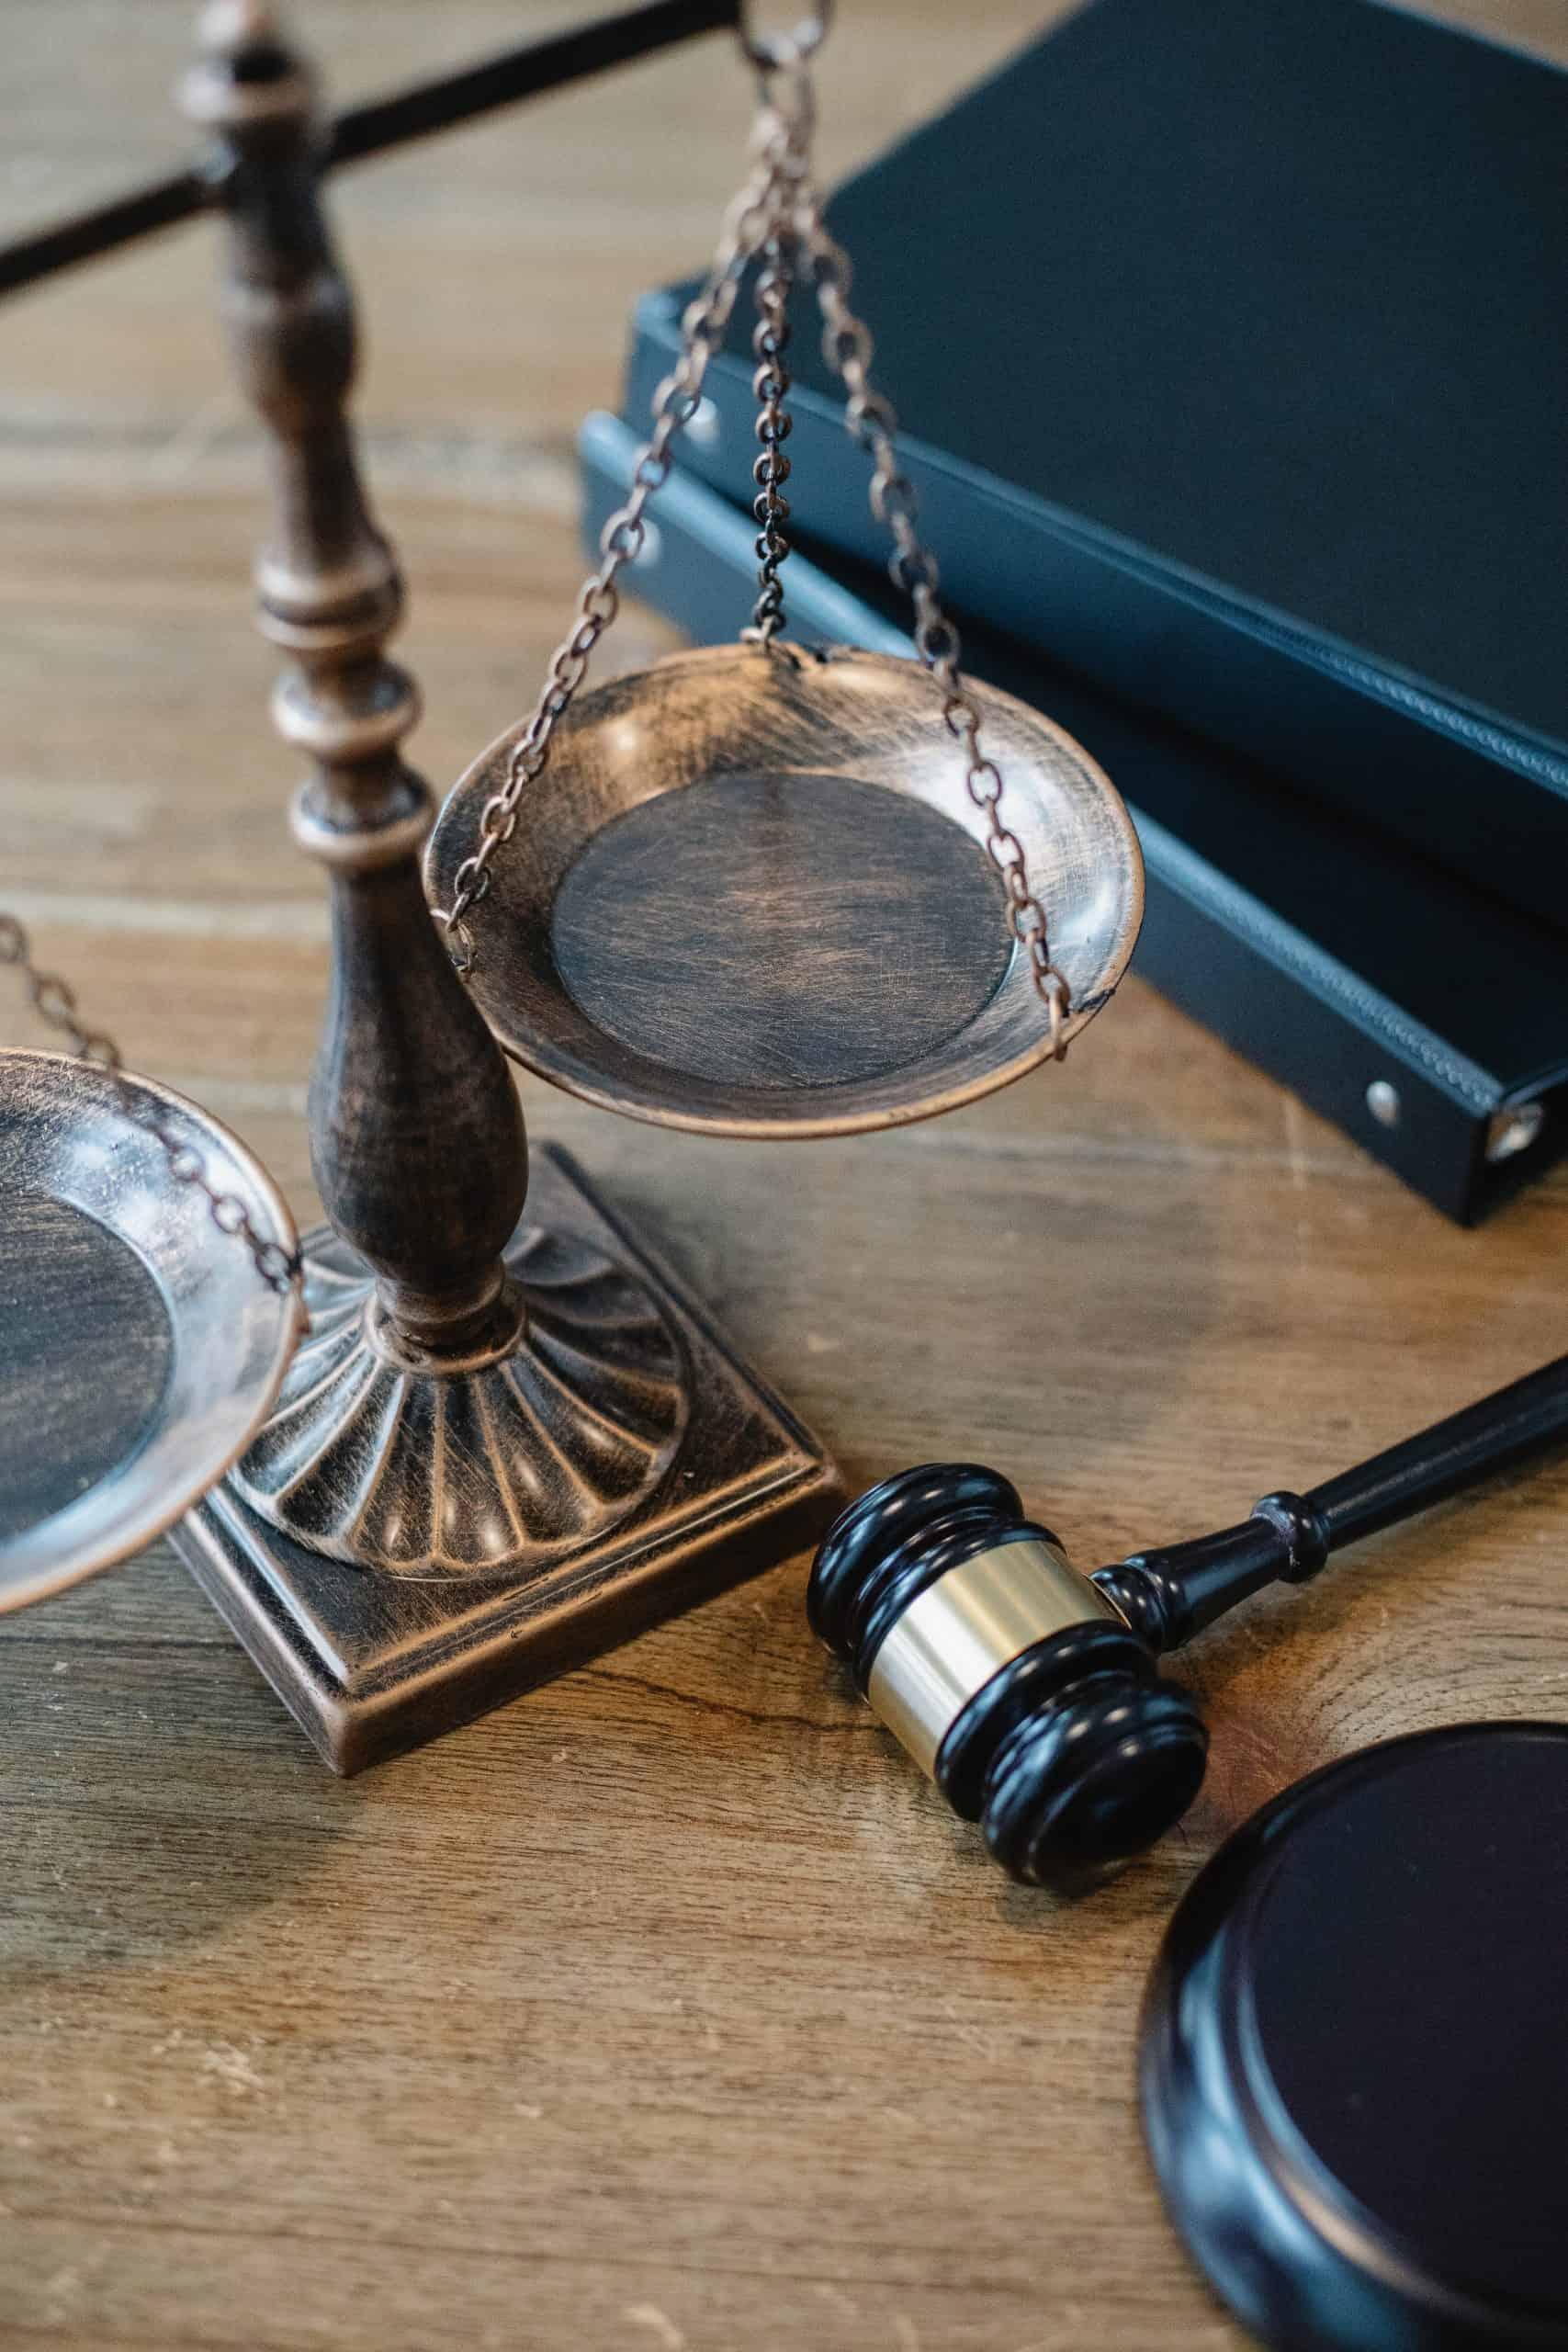 $5,000,000 Punishment for Misleading and Deceptive Conduct Despite No Proven Harm